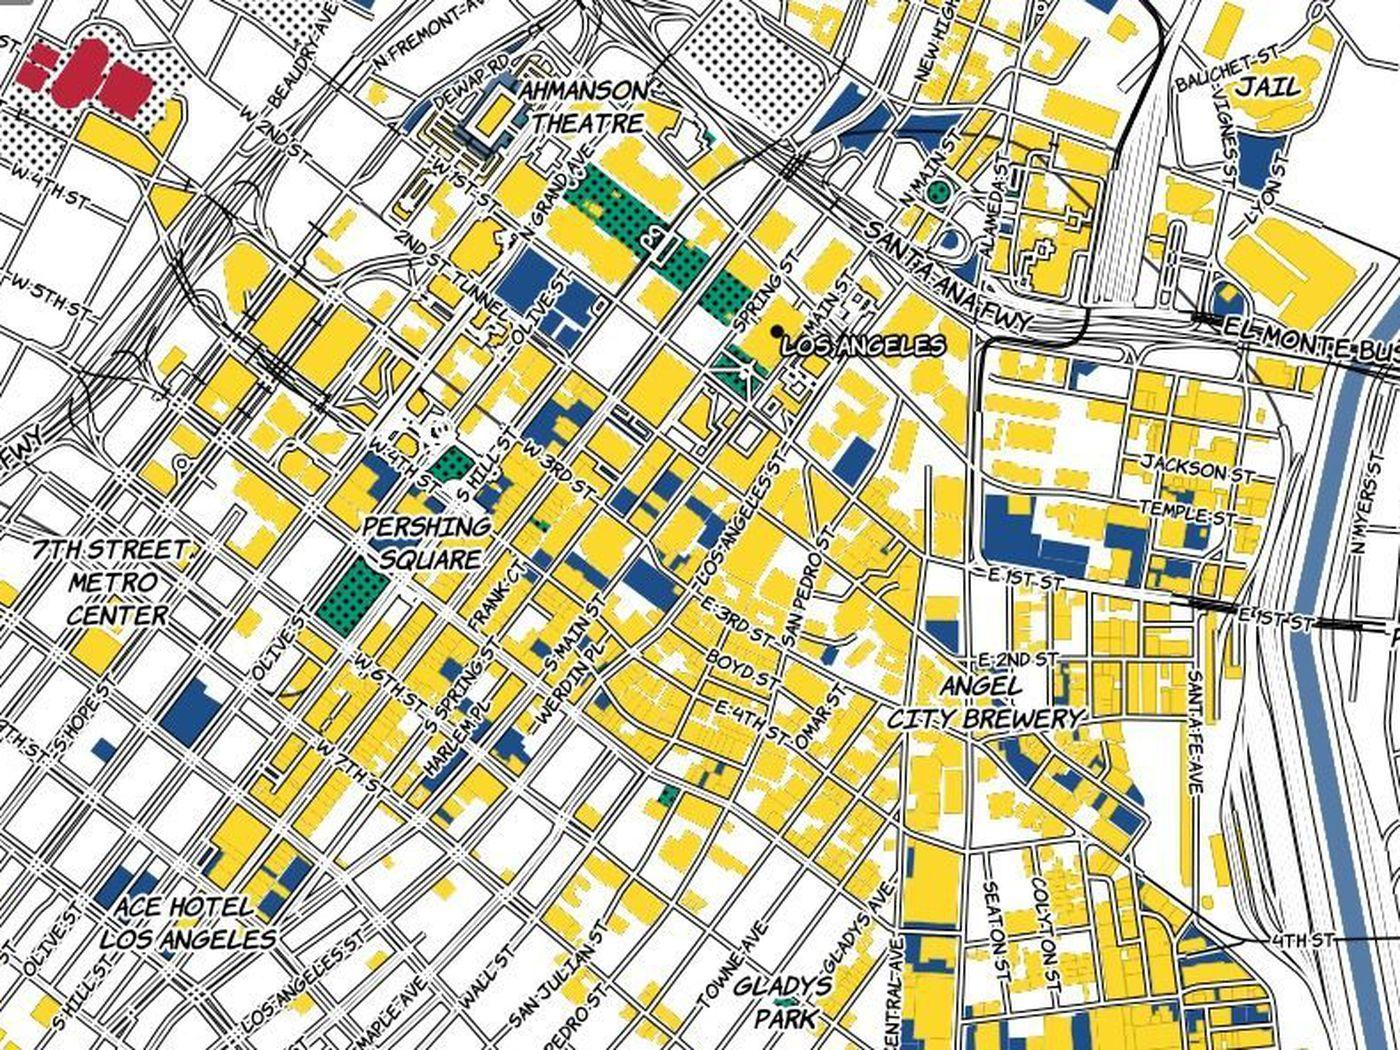 Los Angeles As Pop Artist Roy Lichtenstein Mightve Mapped It - Los angeles map wallpaper